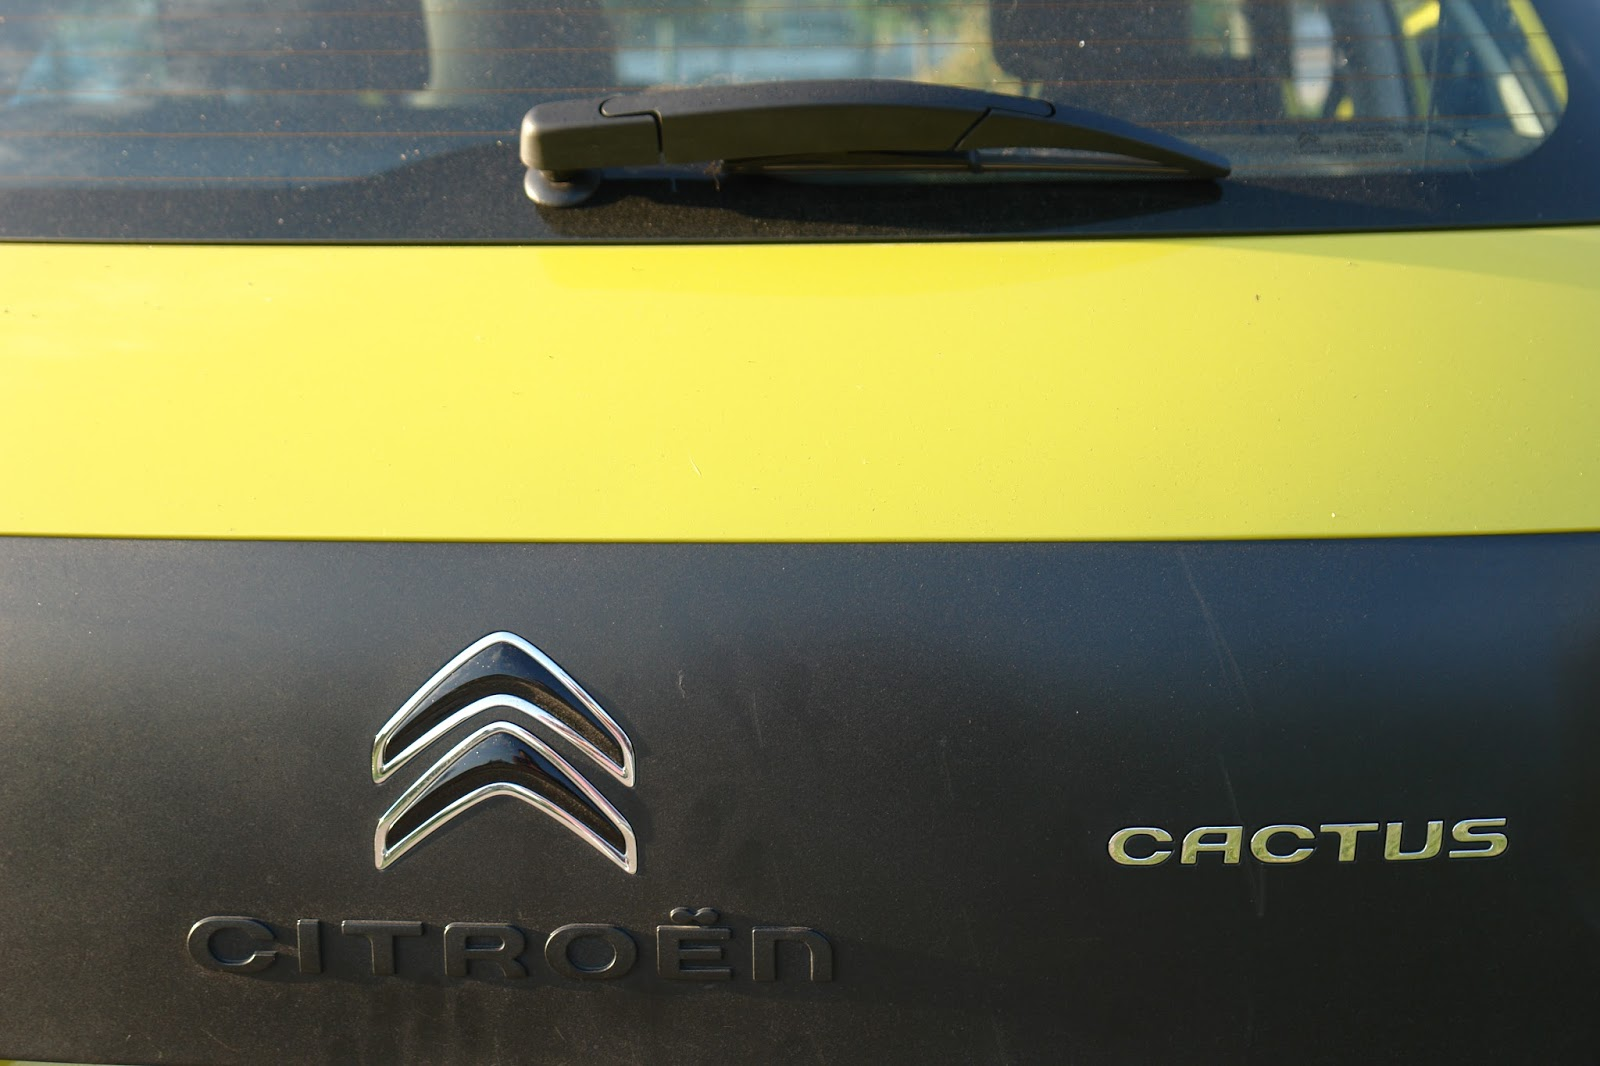 logo Τι κάνει το Citroen Cactus ξεχωριστό; citroen, citroen cactus, TEST, ΔΟΚΙΜΕΣ